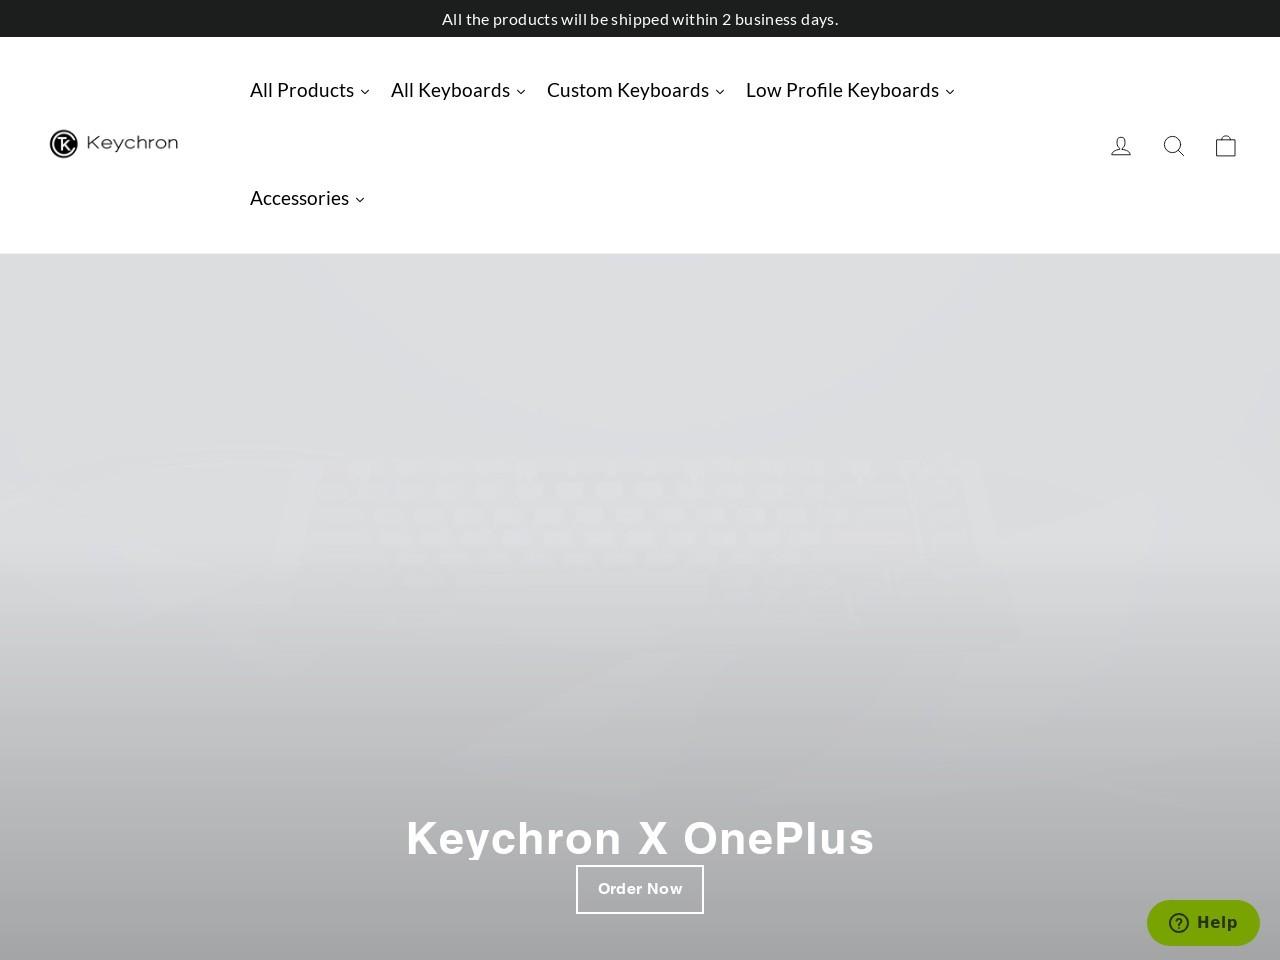 https%3A%2F%2Fwww.keychron-「Keychron K1(V2)」を購入したのでレビュー!RGBバックライト搭載でスリム&ワイヤレスキーボード